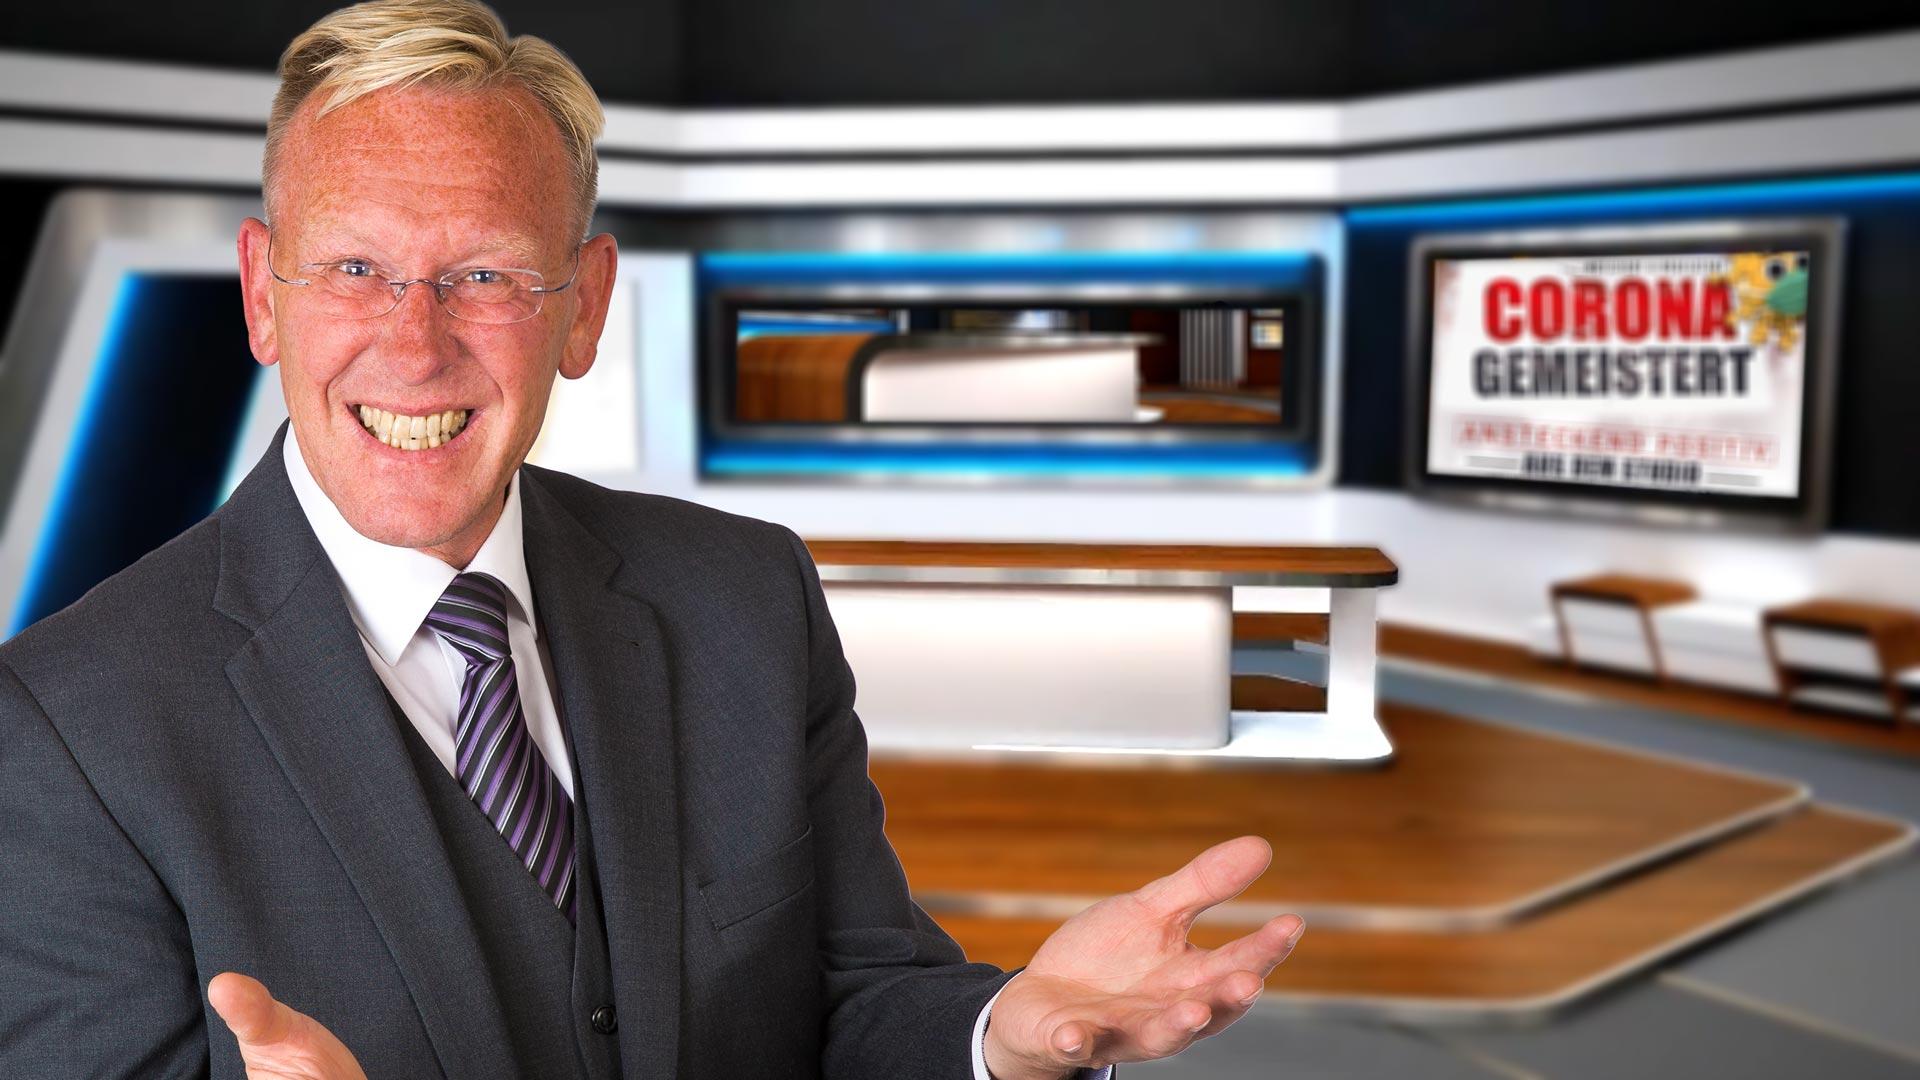 TV-Moderator Dirk Rabis im TV-Studio der expertentalkshow.